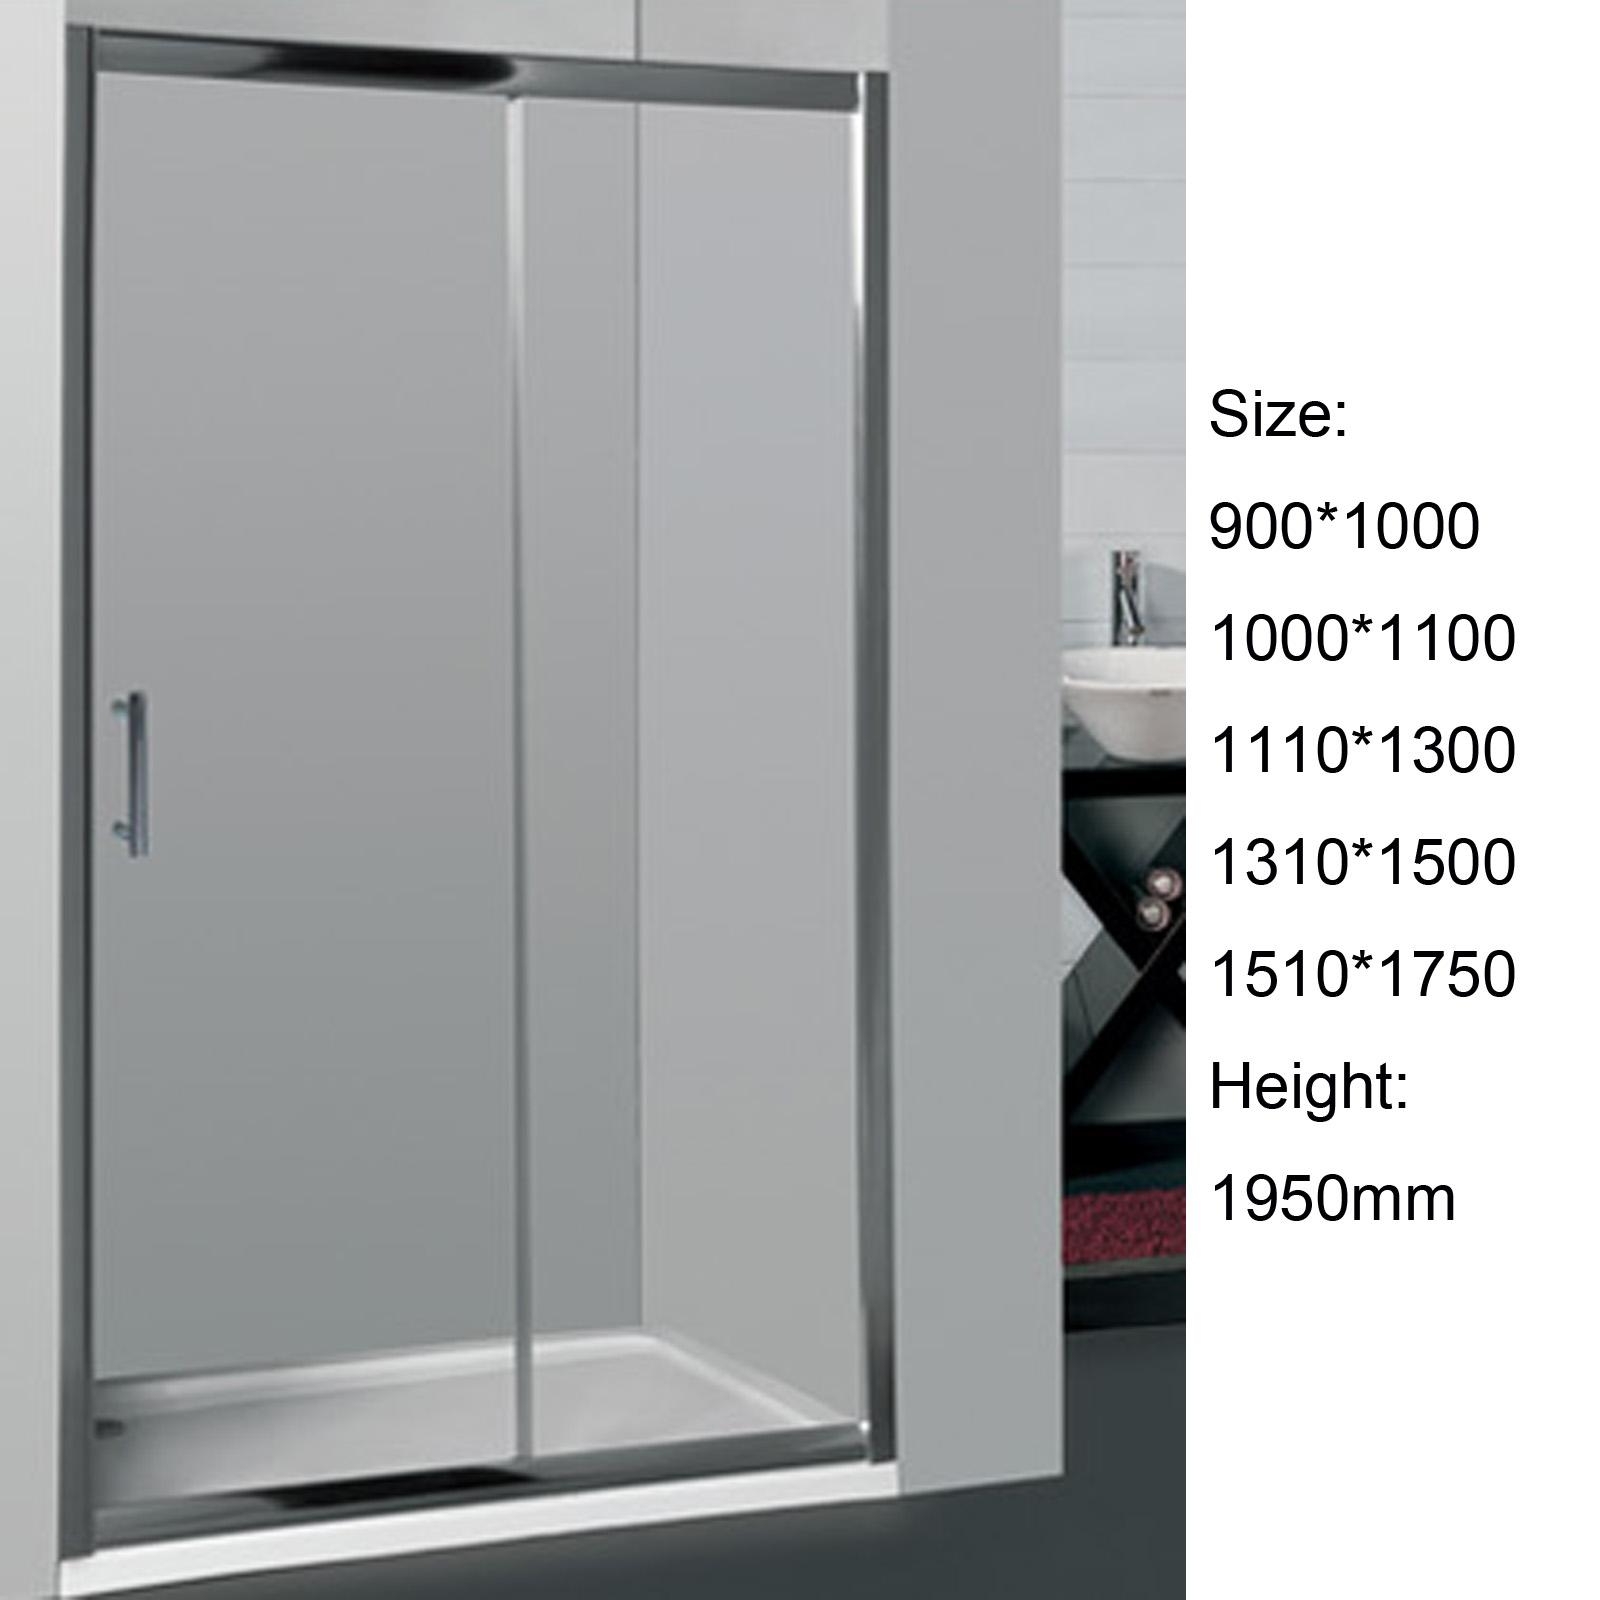 Adjustable 6mm sliding door framed shower screen wall to for 1750 high shower door